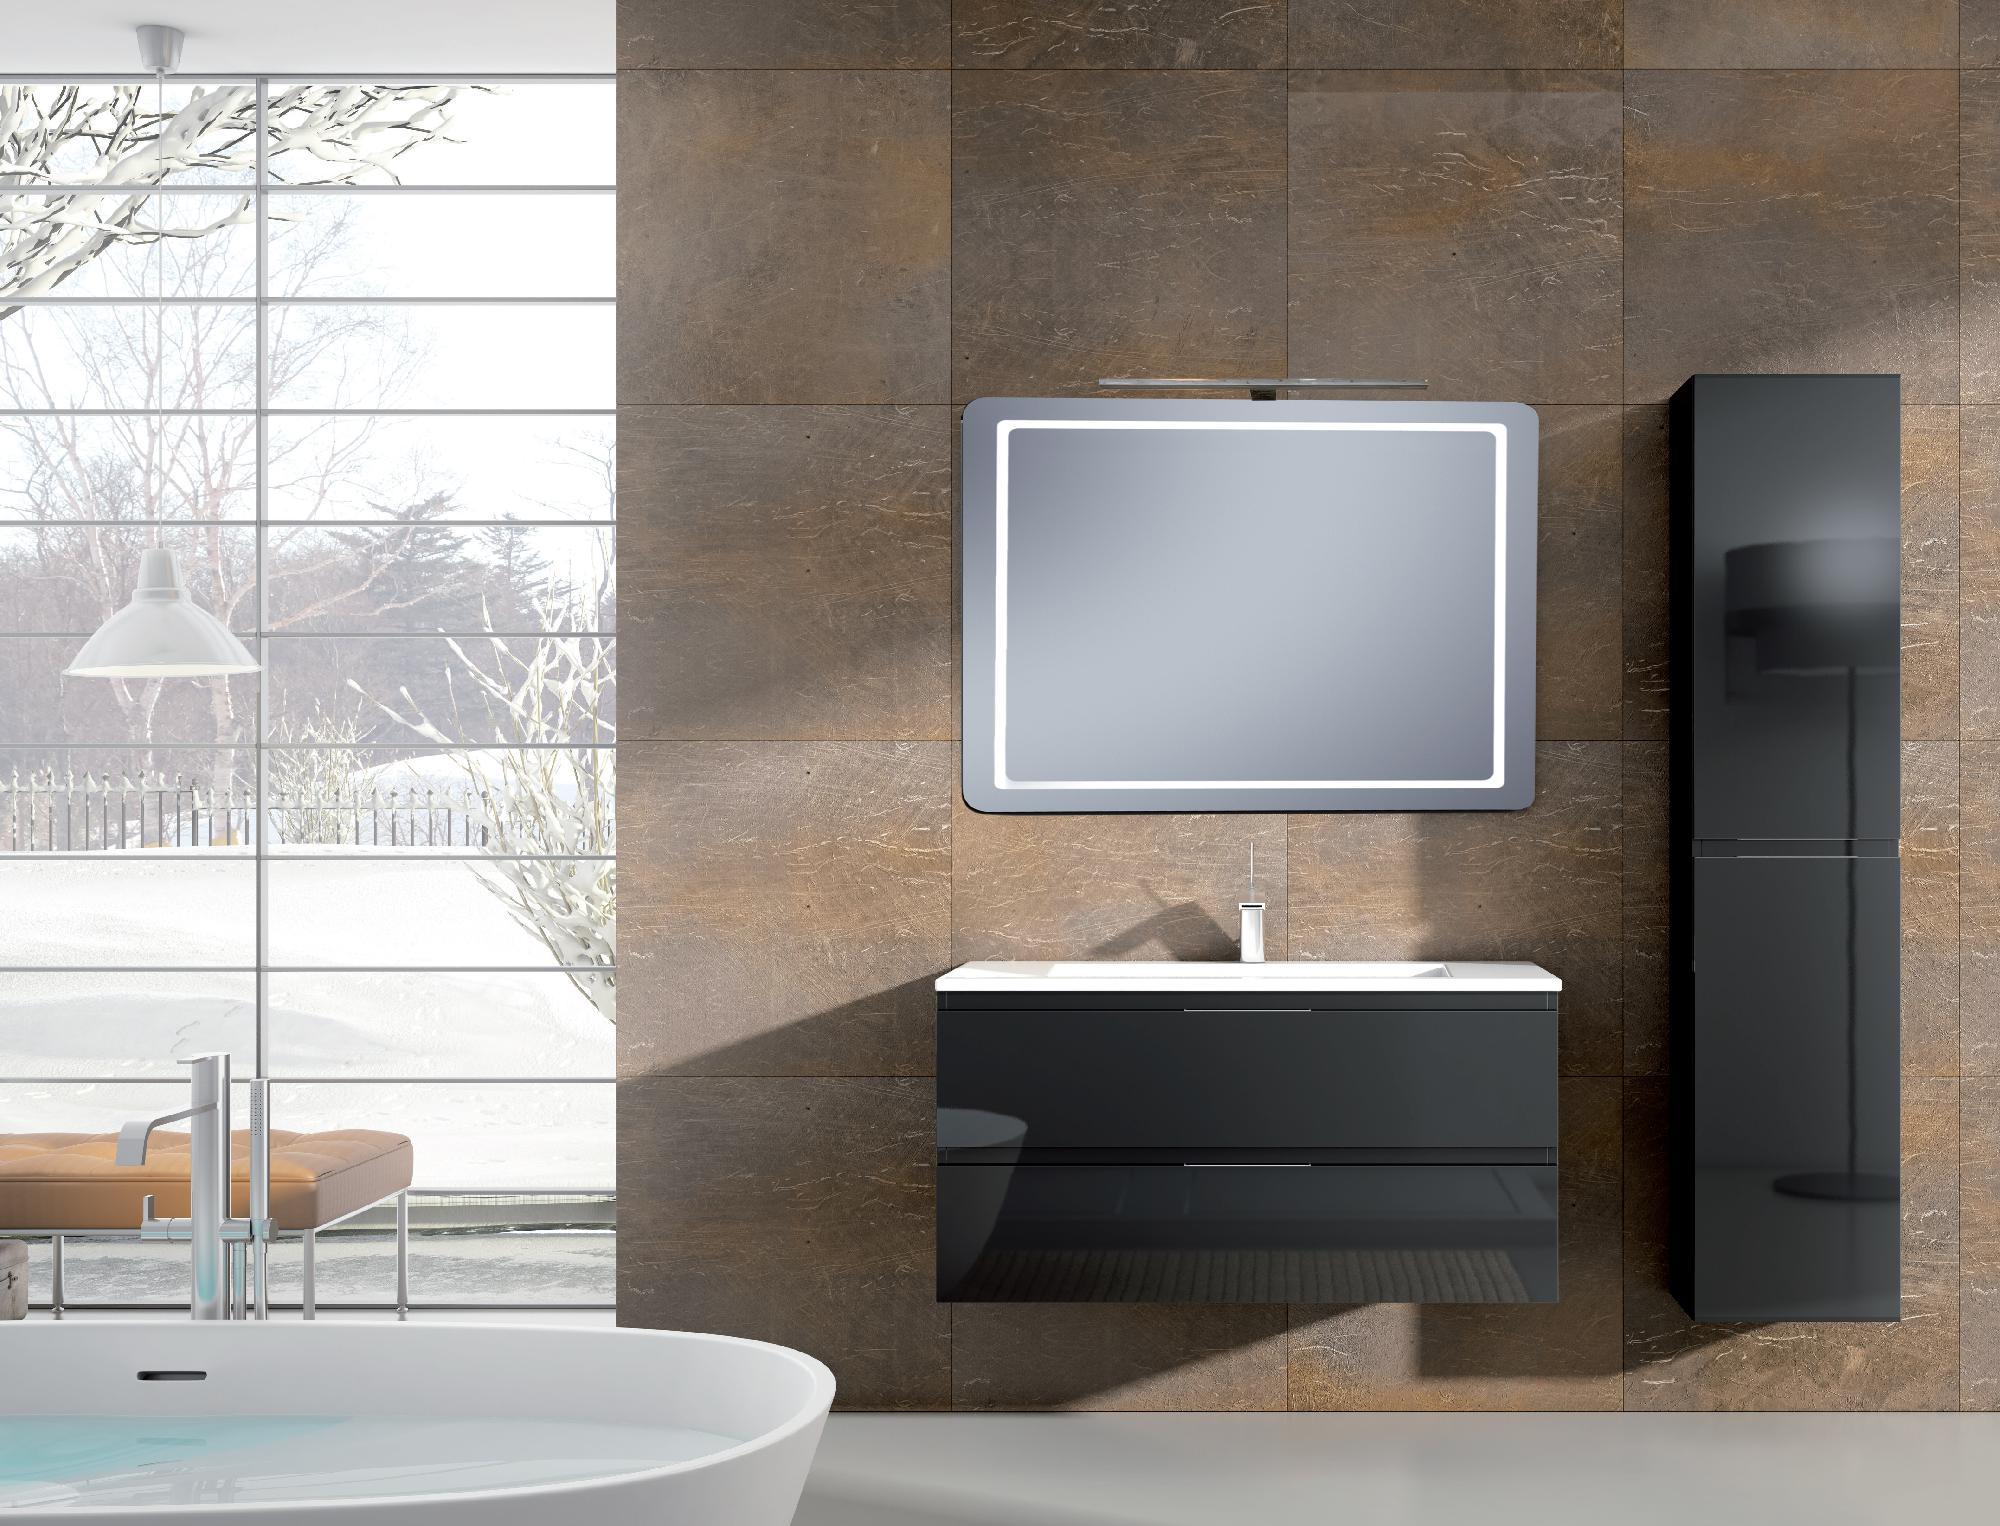 Mueble de baño colección Modena